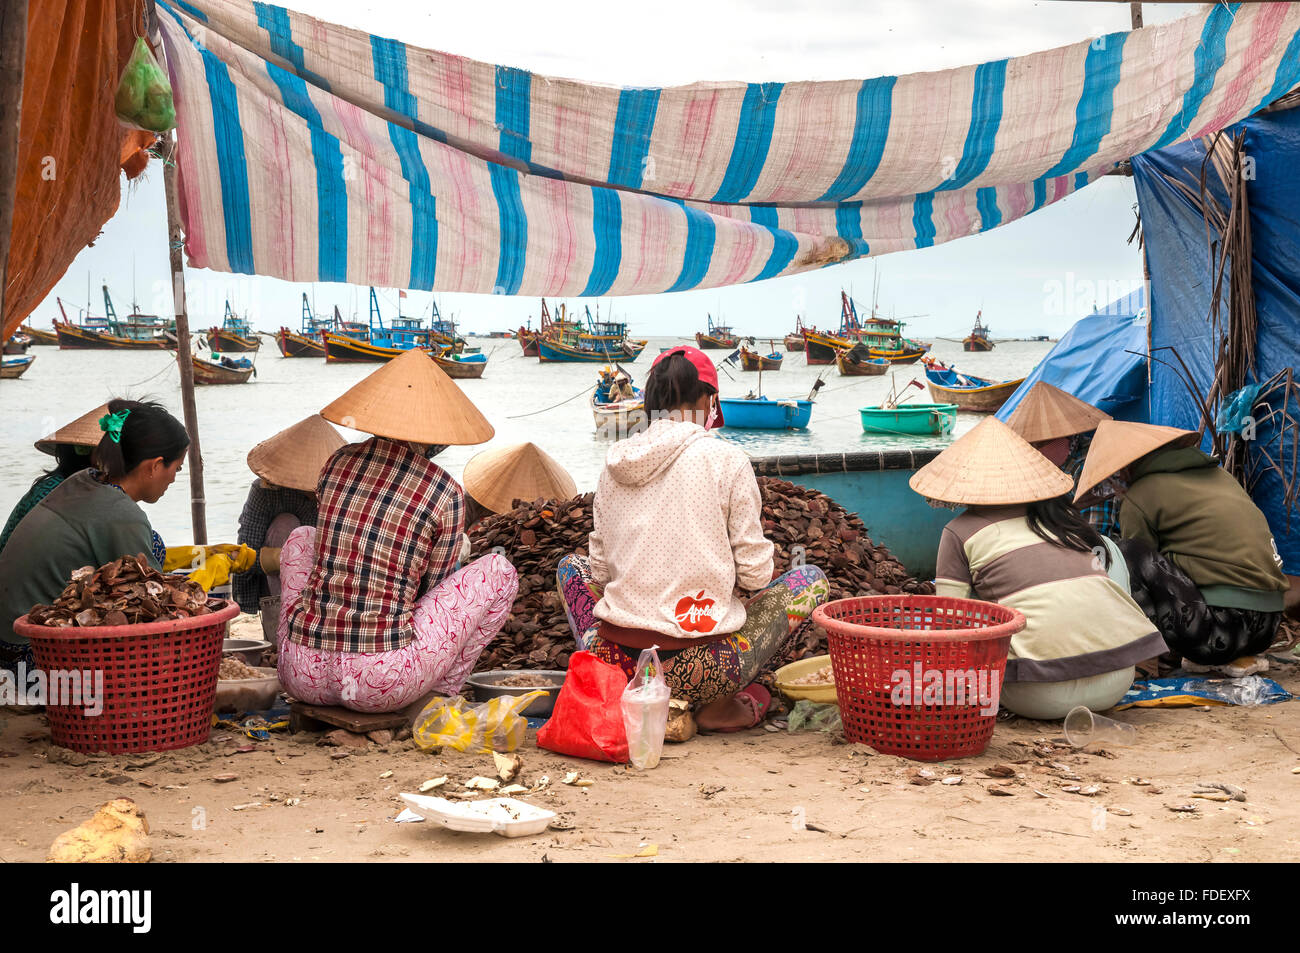 Viet Nam. Vietnam. East Asia. Mui Ne Beach, Binh Thuan, - Stock Image